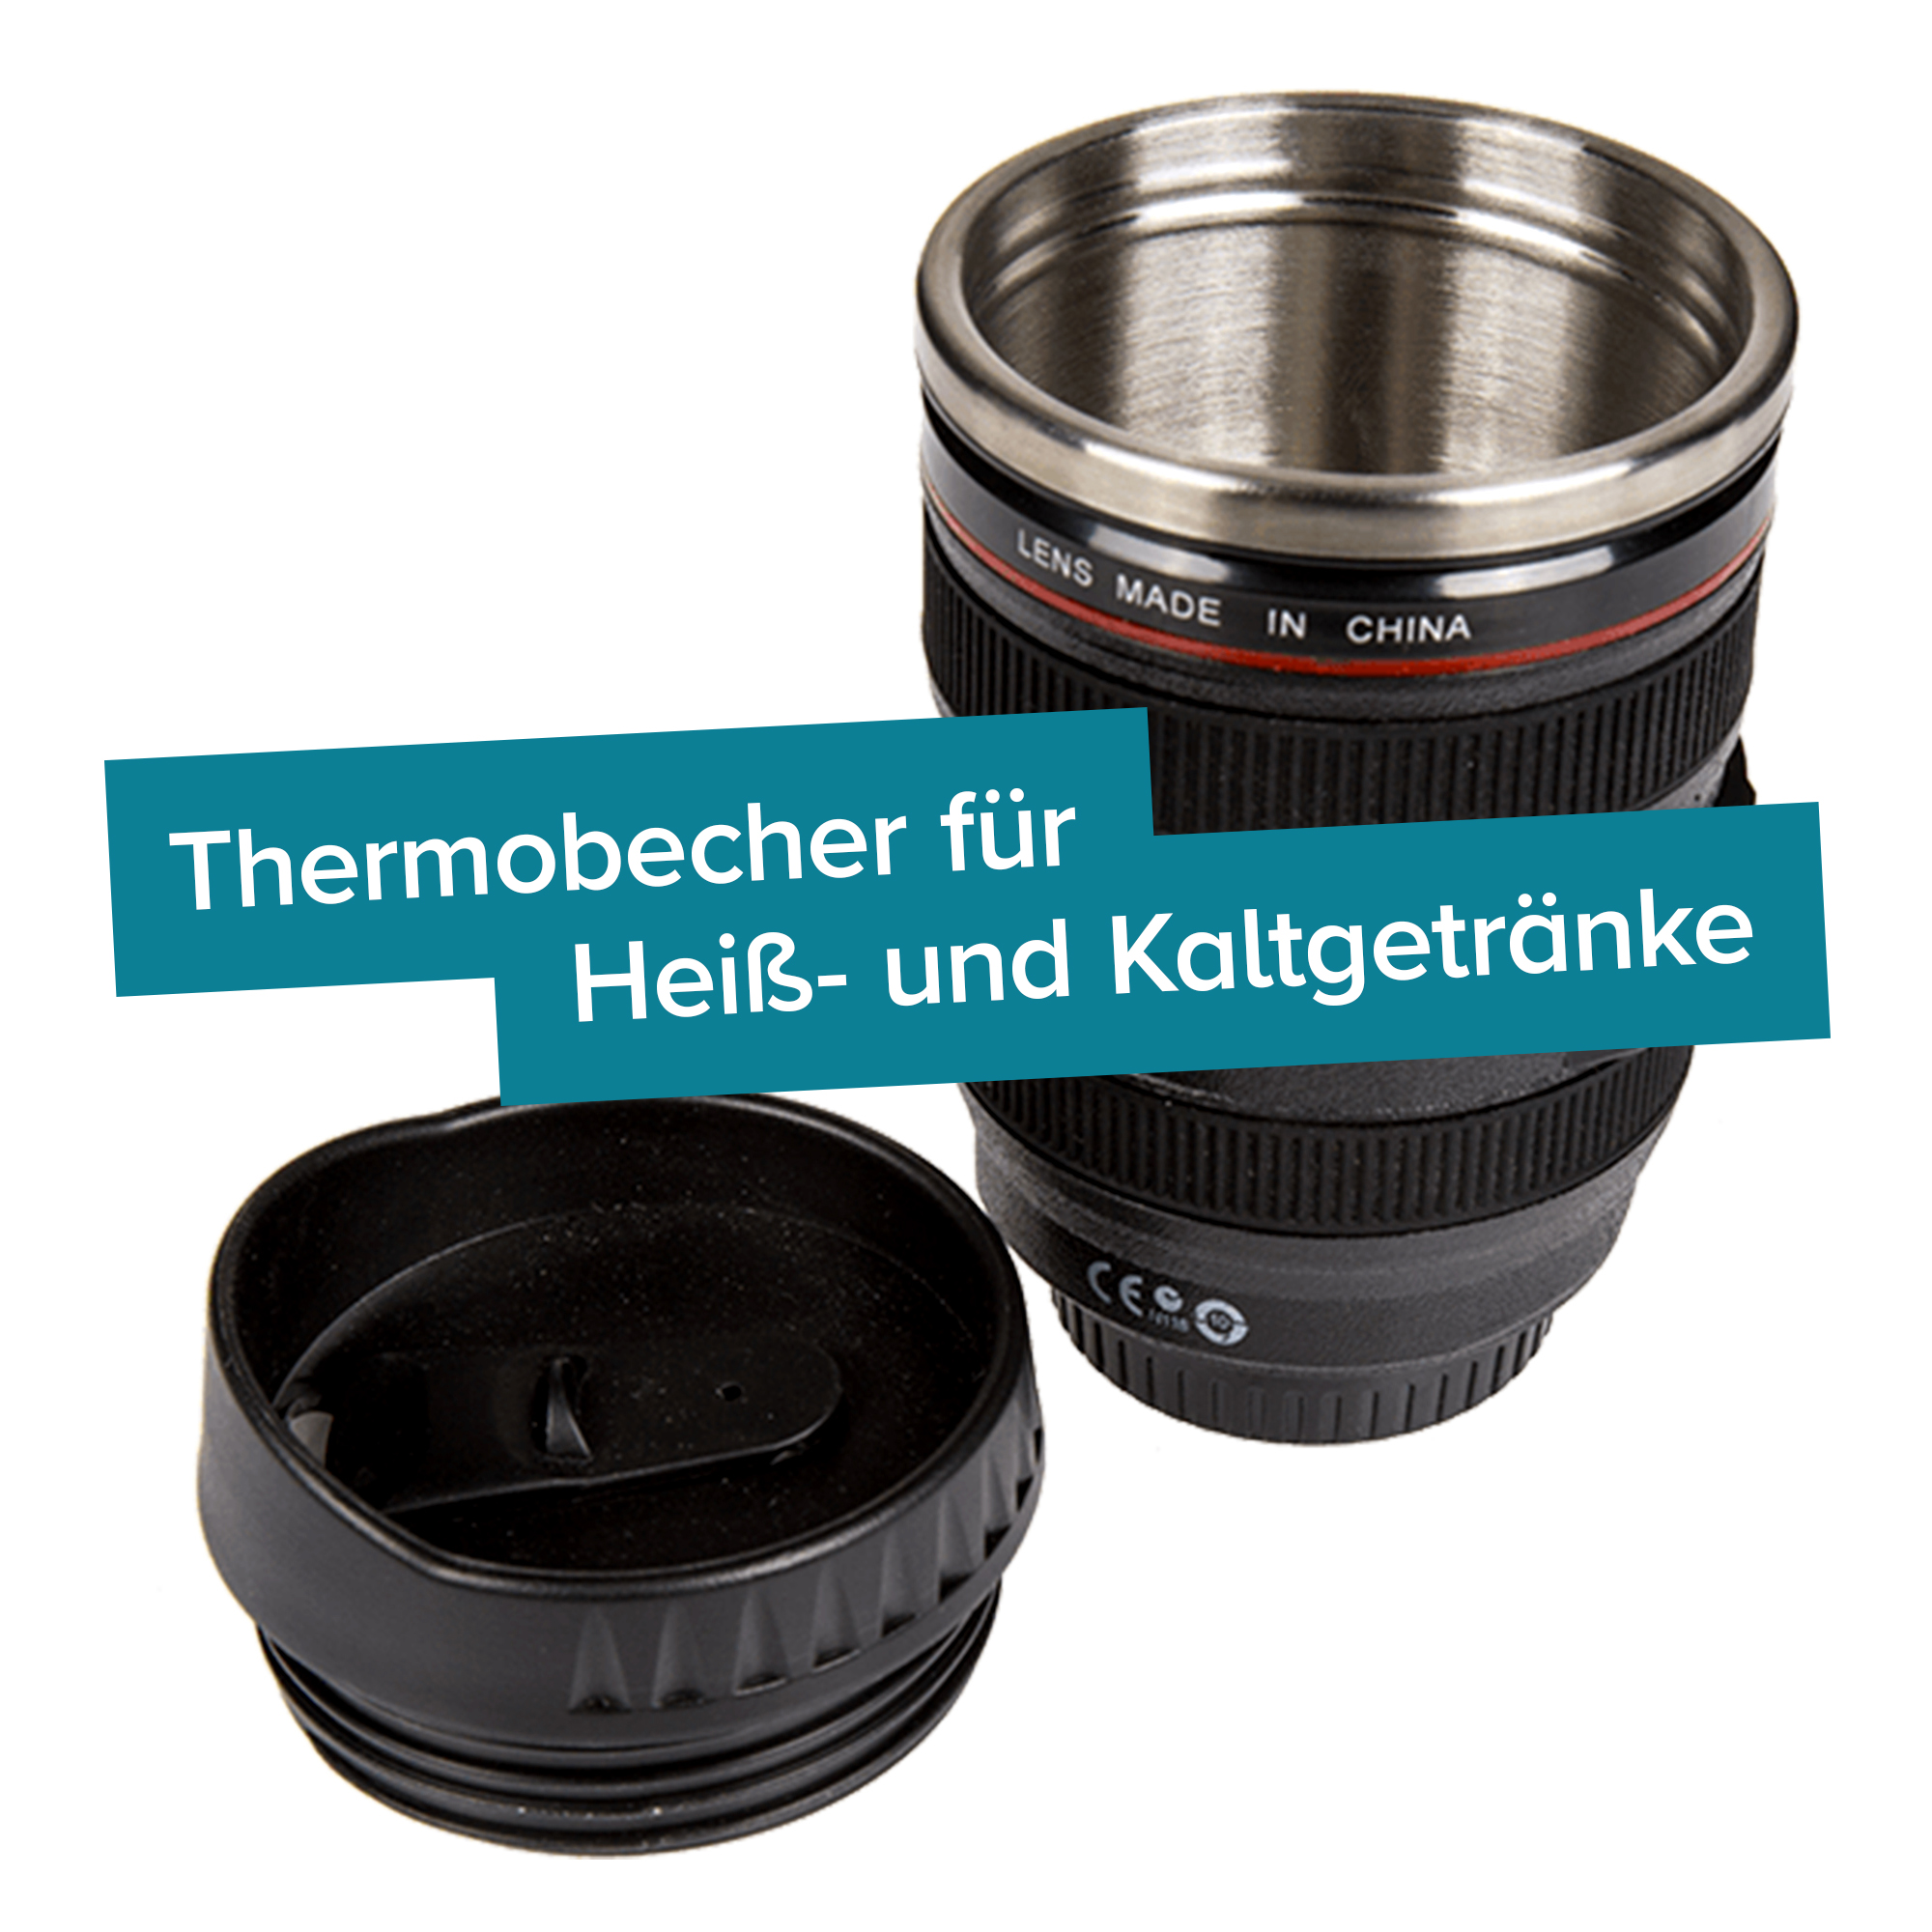 Thermo Kaffeebecher - Kamera Objektiv - 3